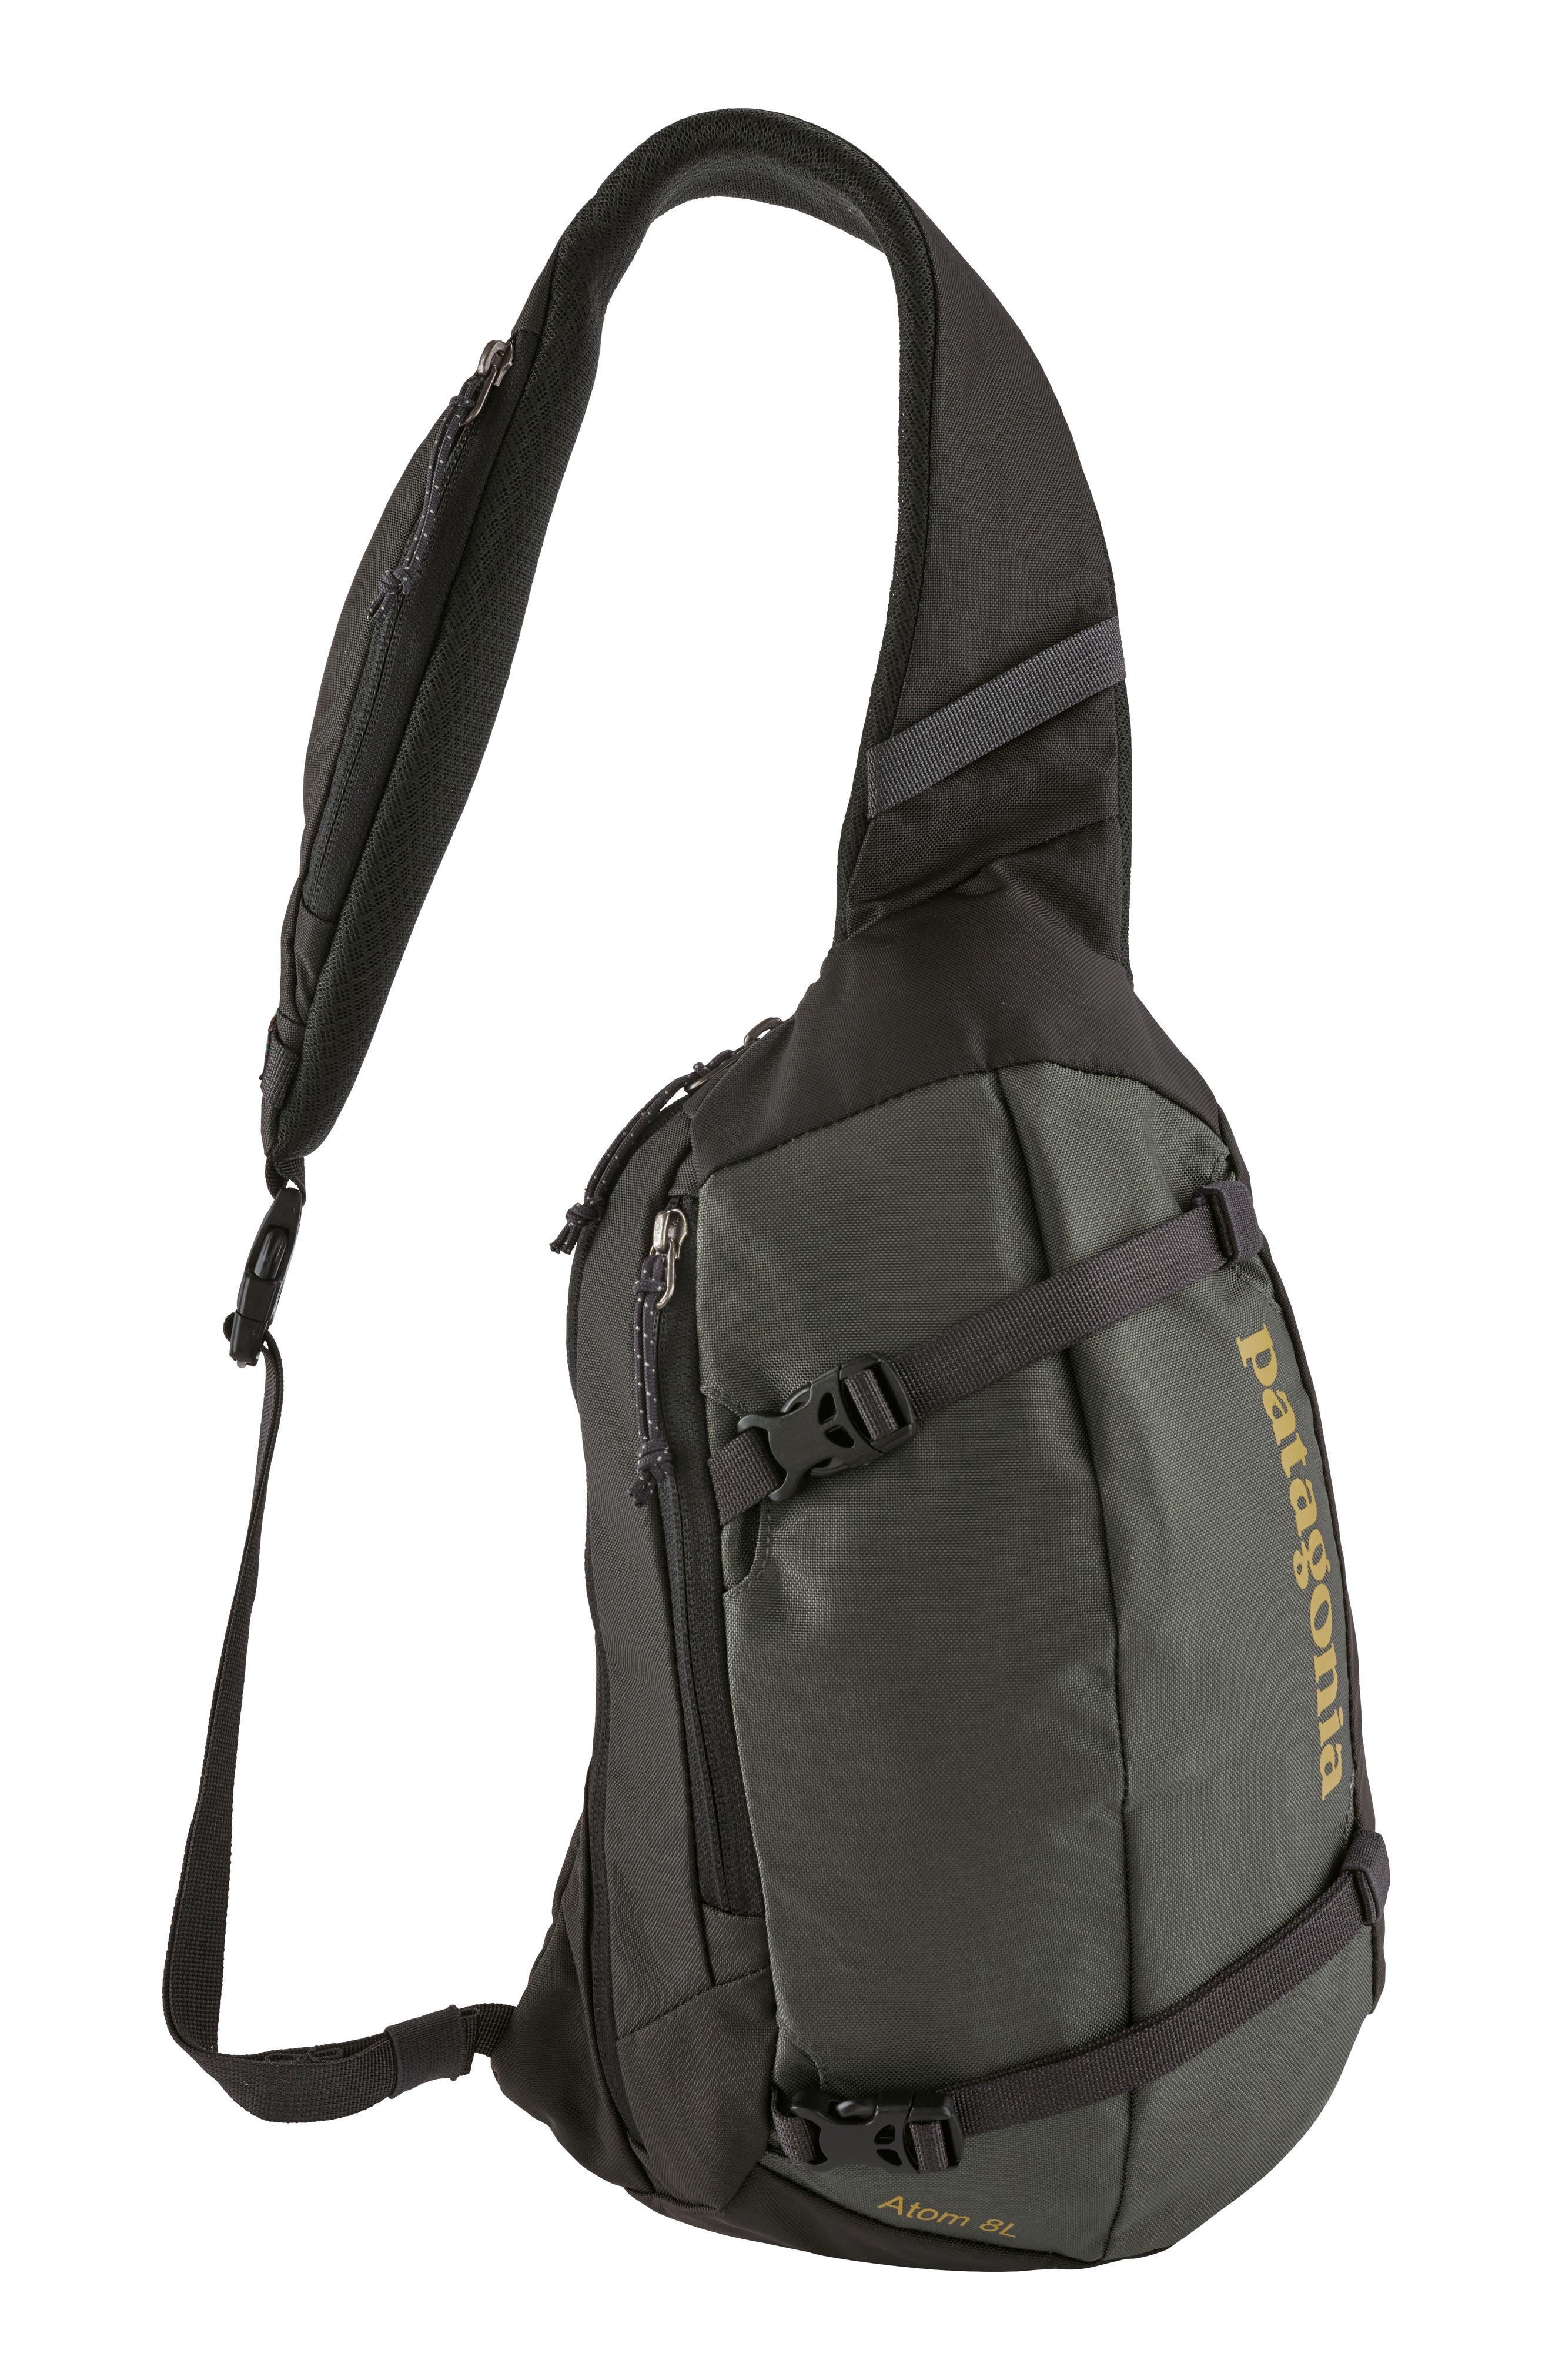 Atom 8L Sling Backpack,                         Main,                         color, FORT FORGE GREY W/ GREEN